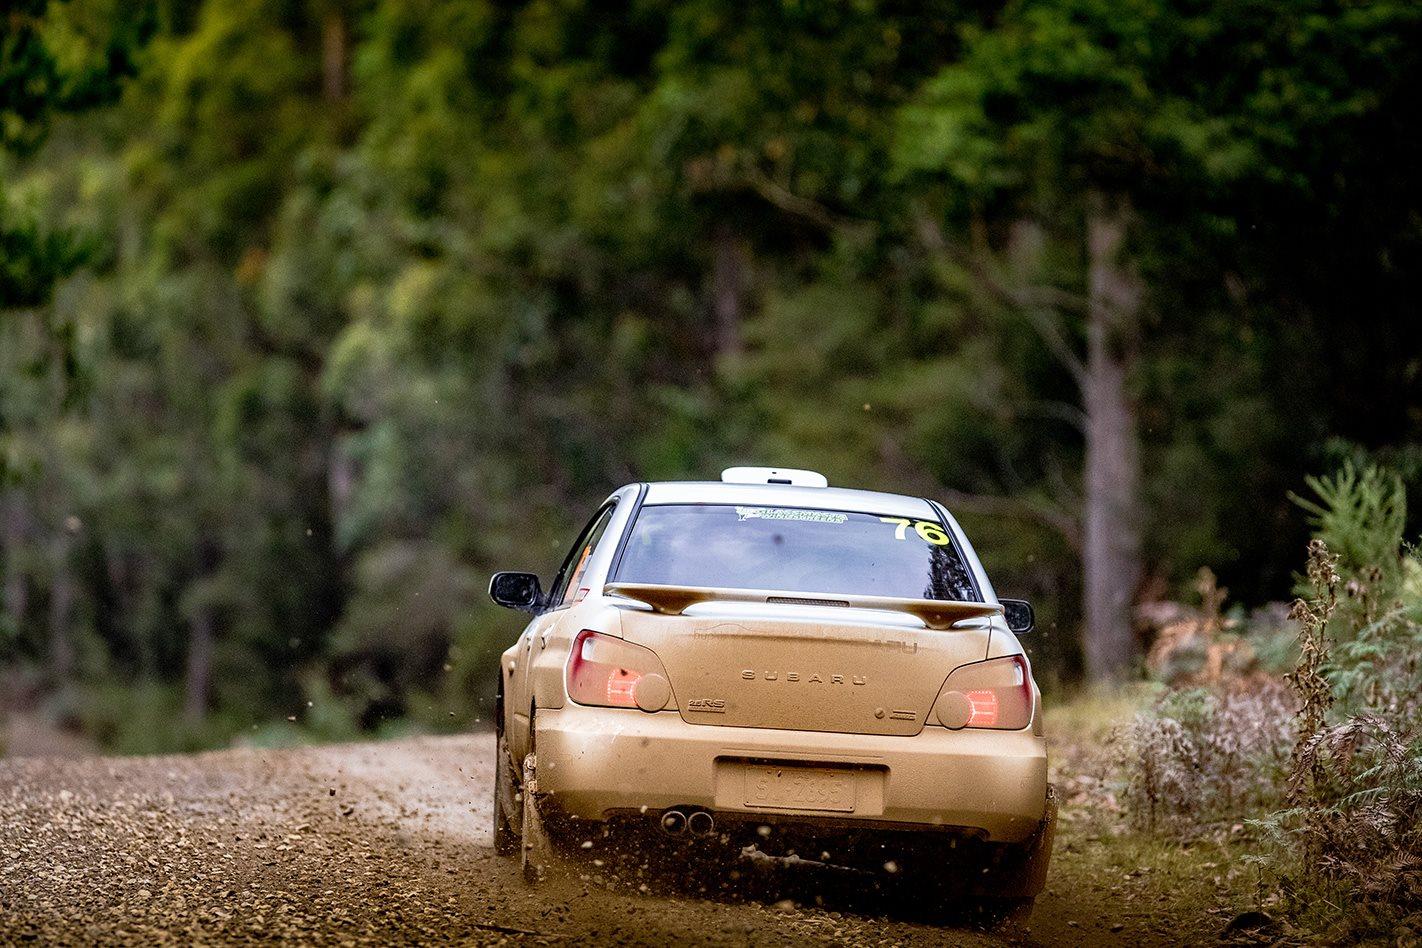 Subaru Impreza RS rear